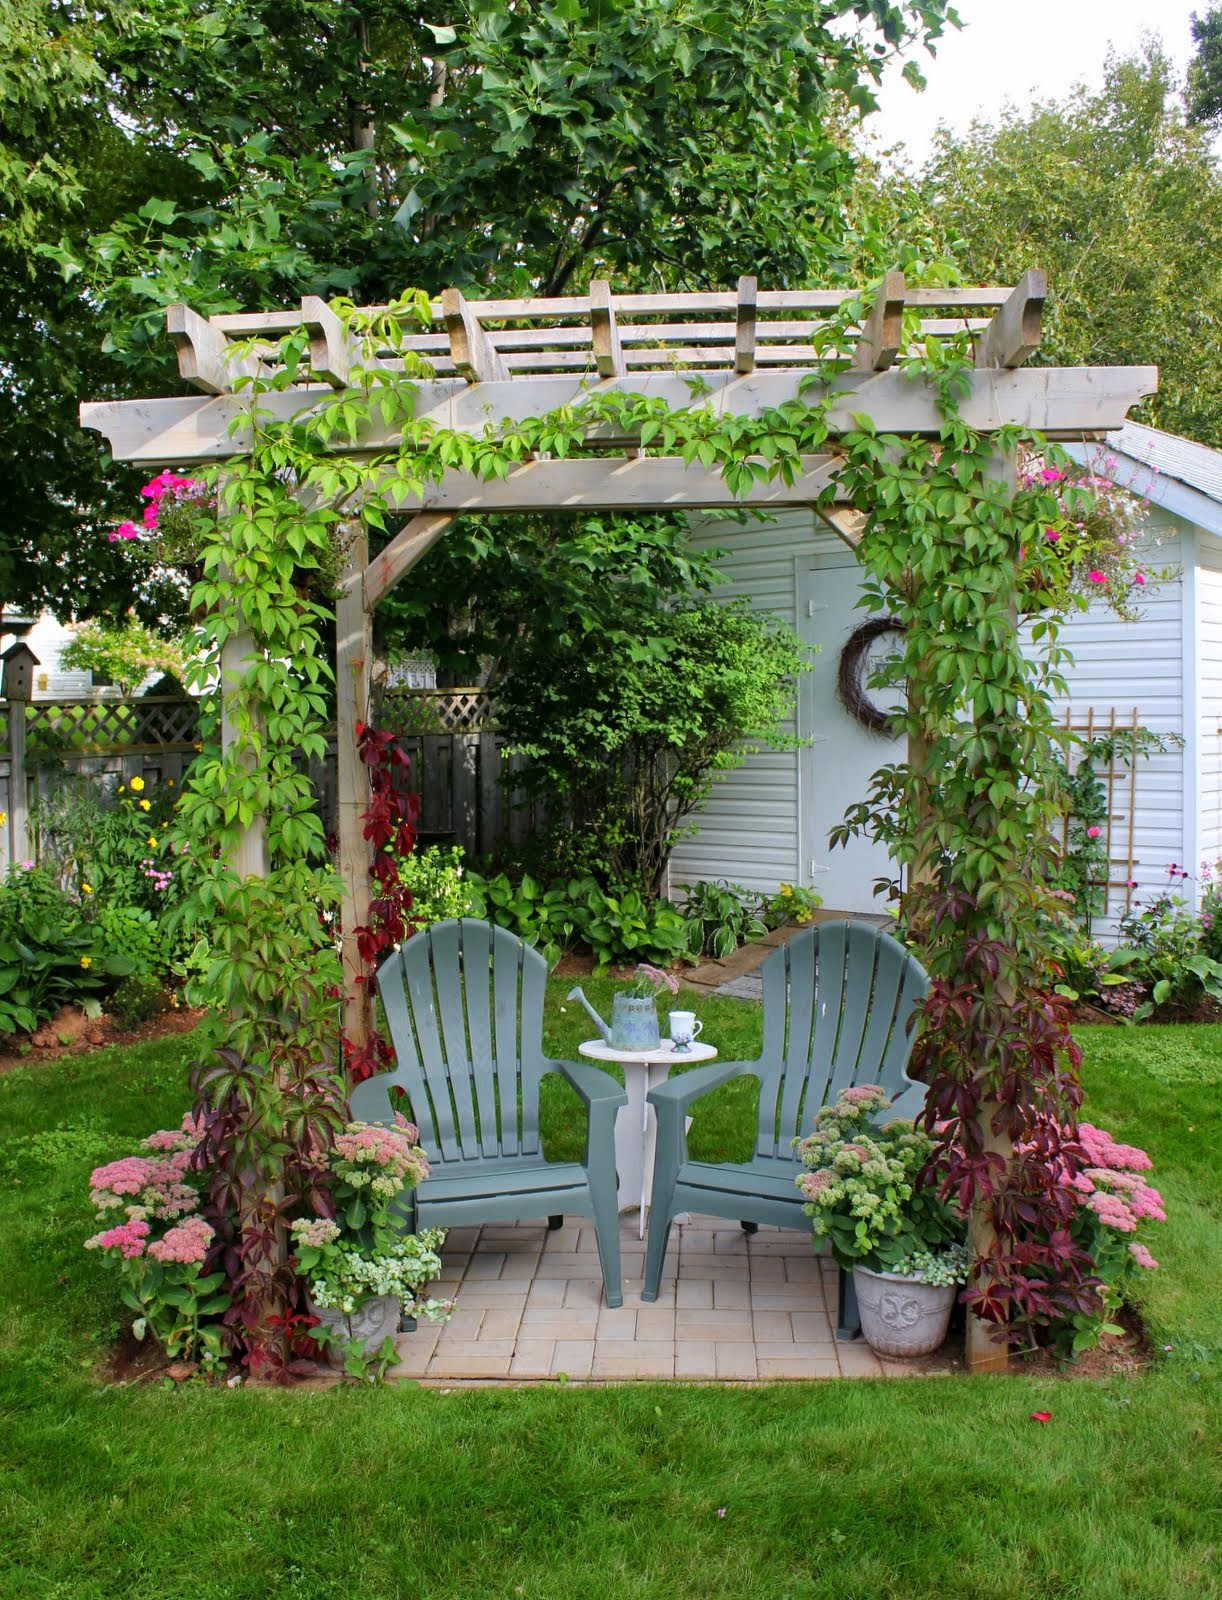 Aiken house gardens beautiful island home for Beautiful house with garden